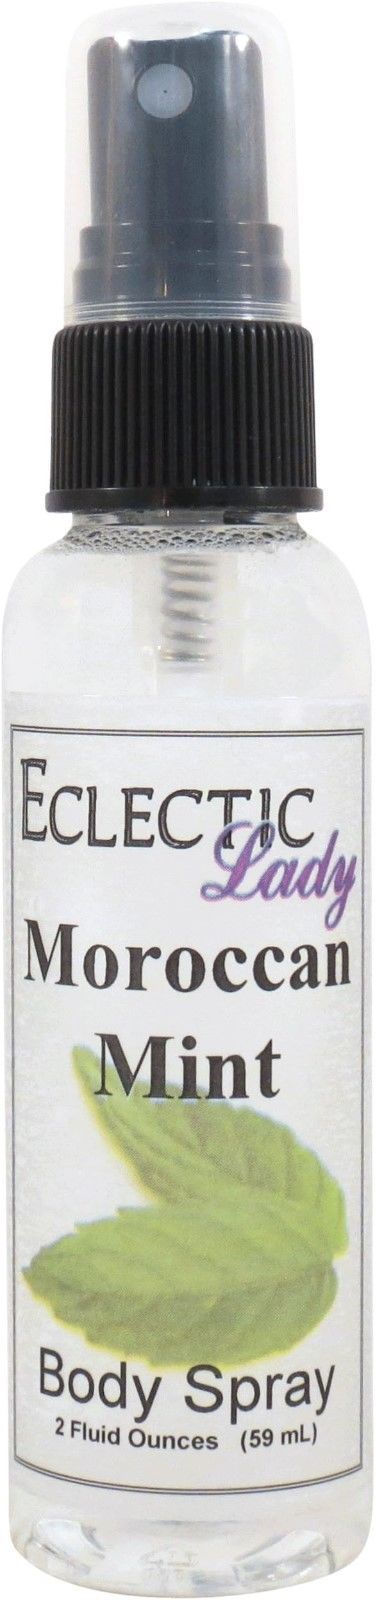 Moroccan Mint Body Spray